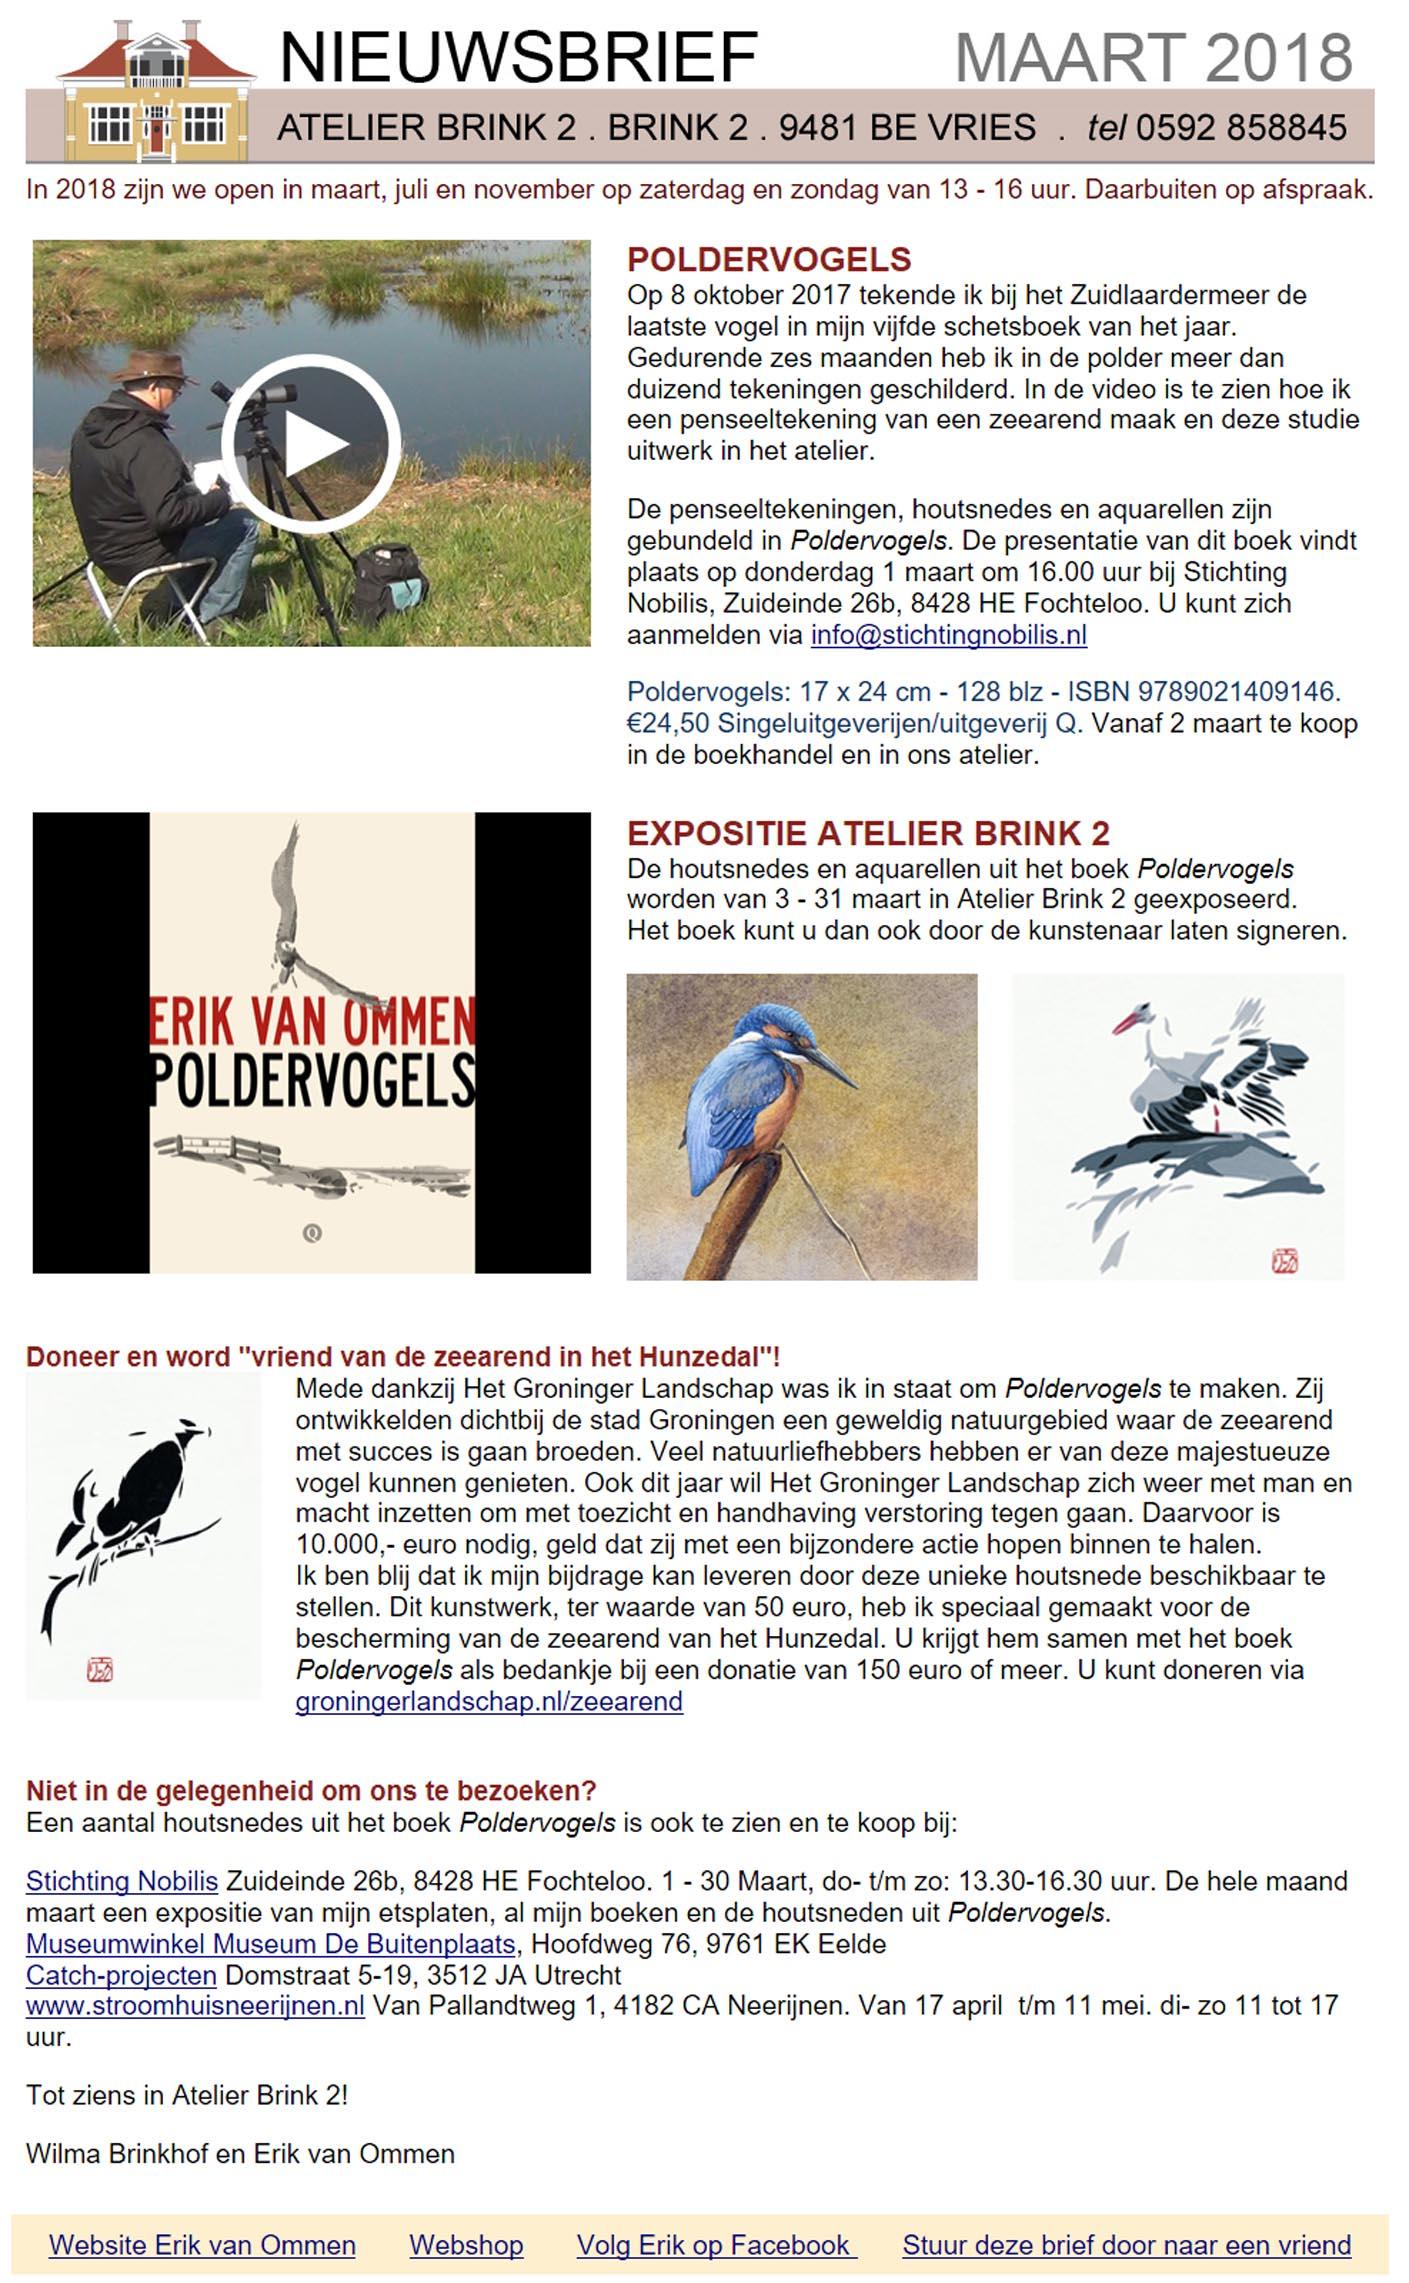 nieuwsbrief poldervogels